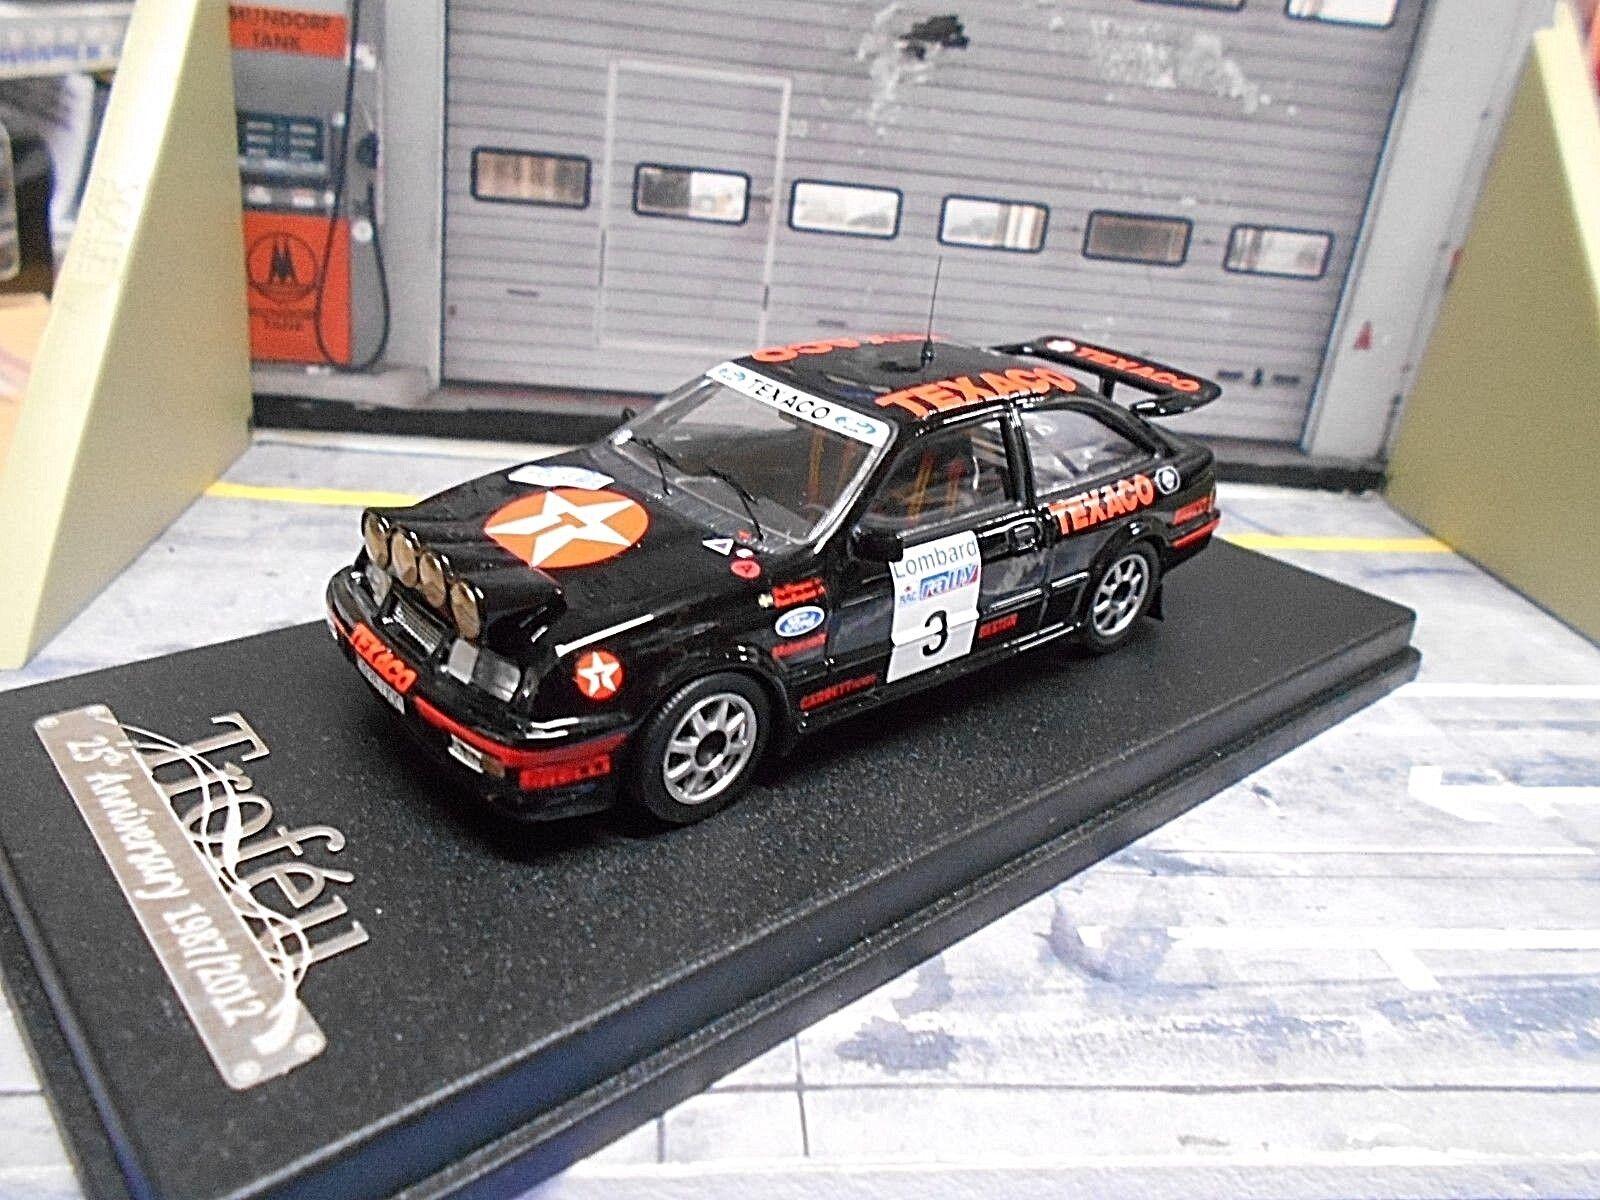 Ford Sierra Cosworth RS RALLYE RAC Go 1987  3 Vatanen Texaco nightv Trofeu 1 43